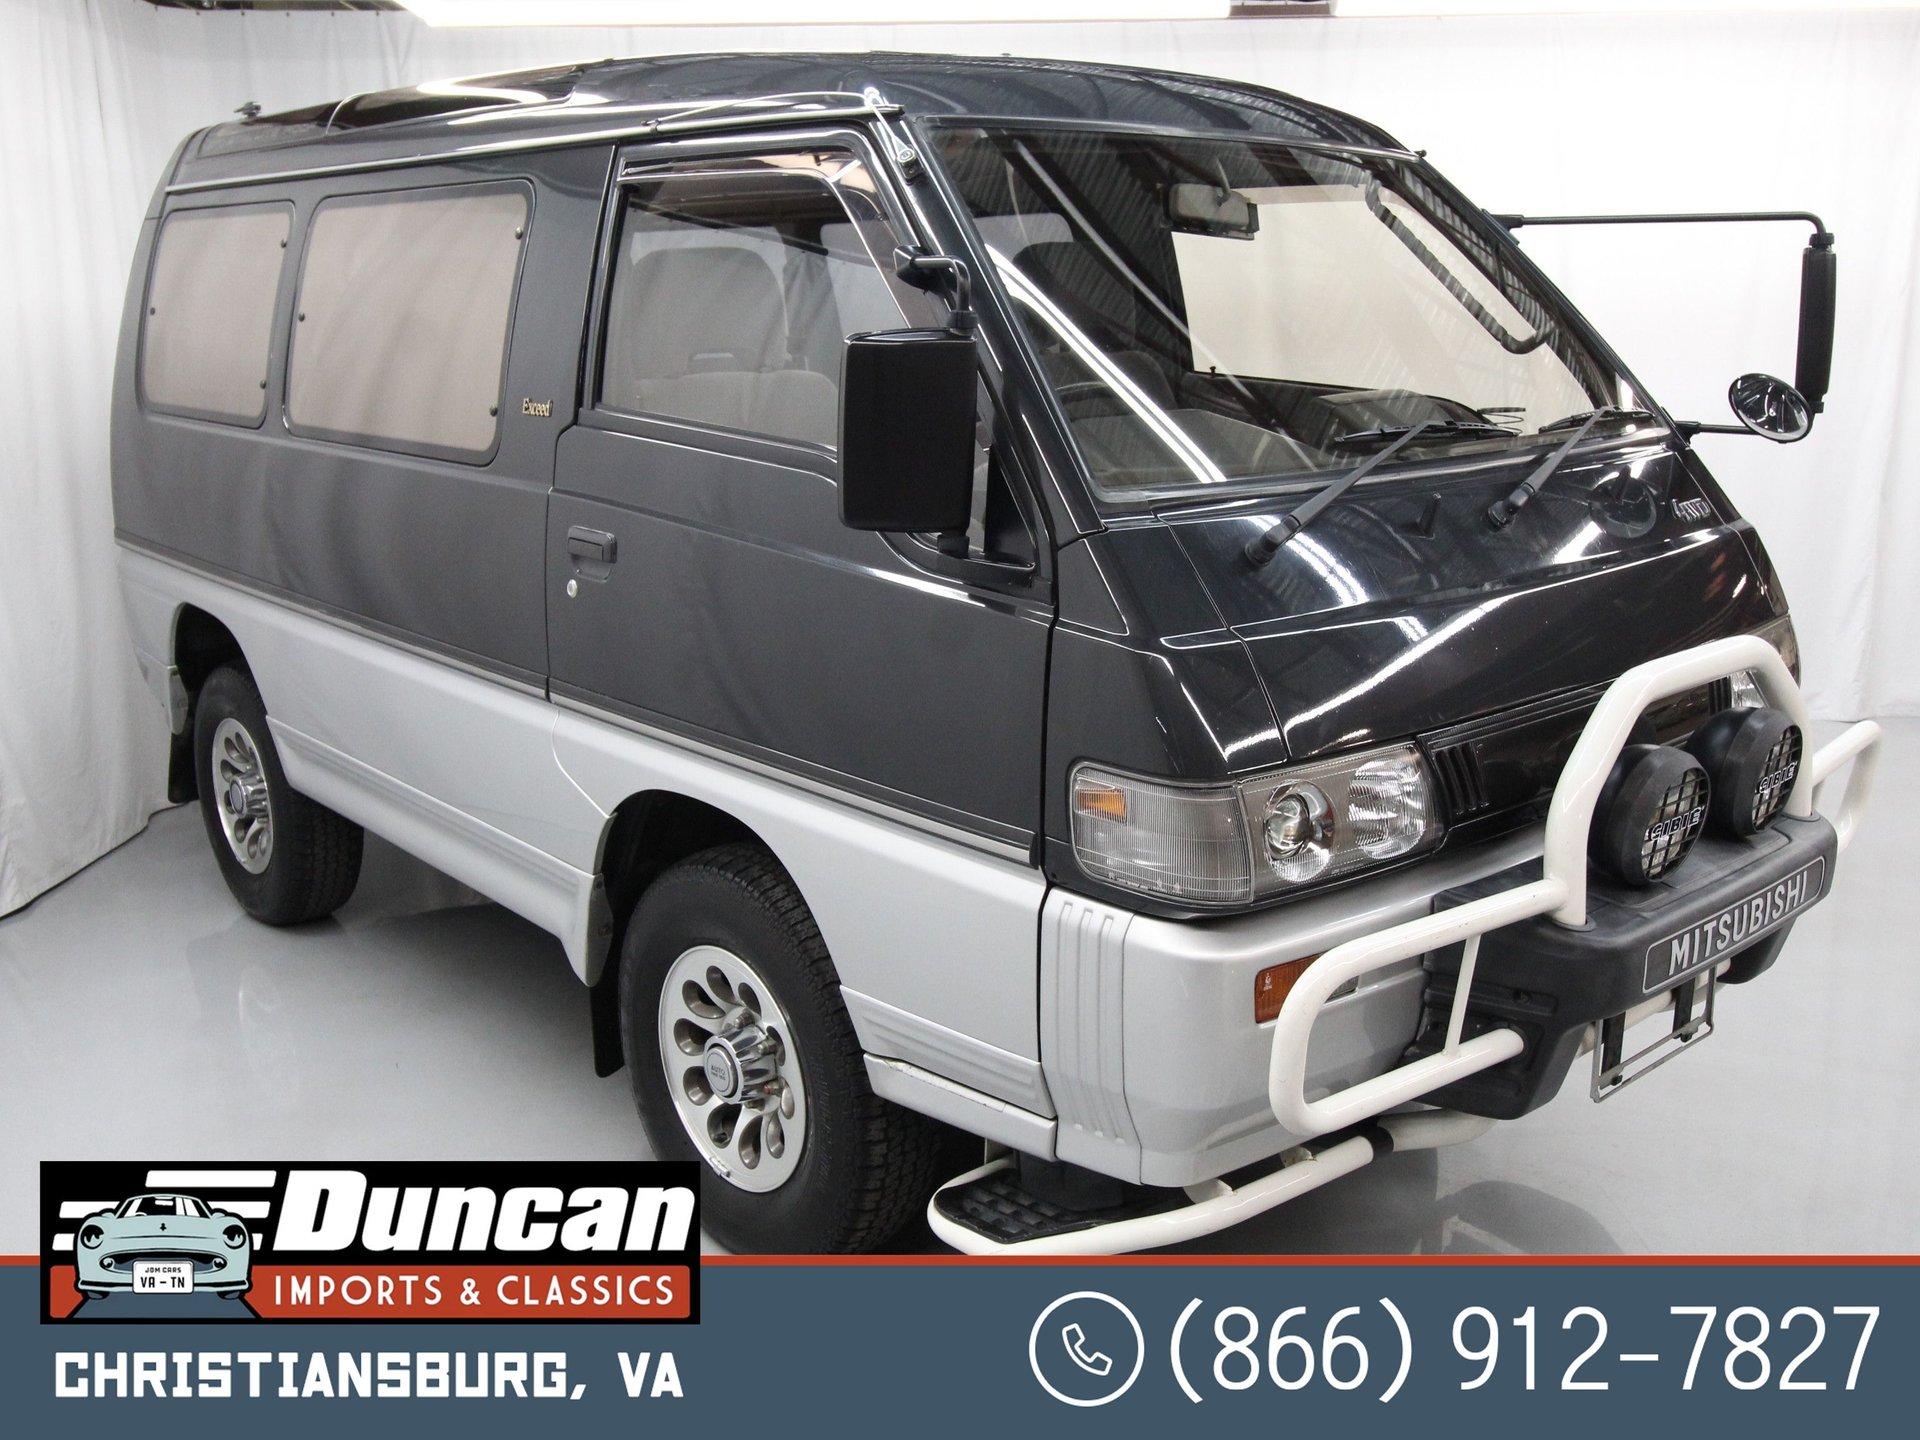 1993 mitsubishi delica exceed 4wd l300